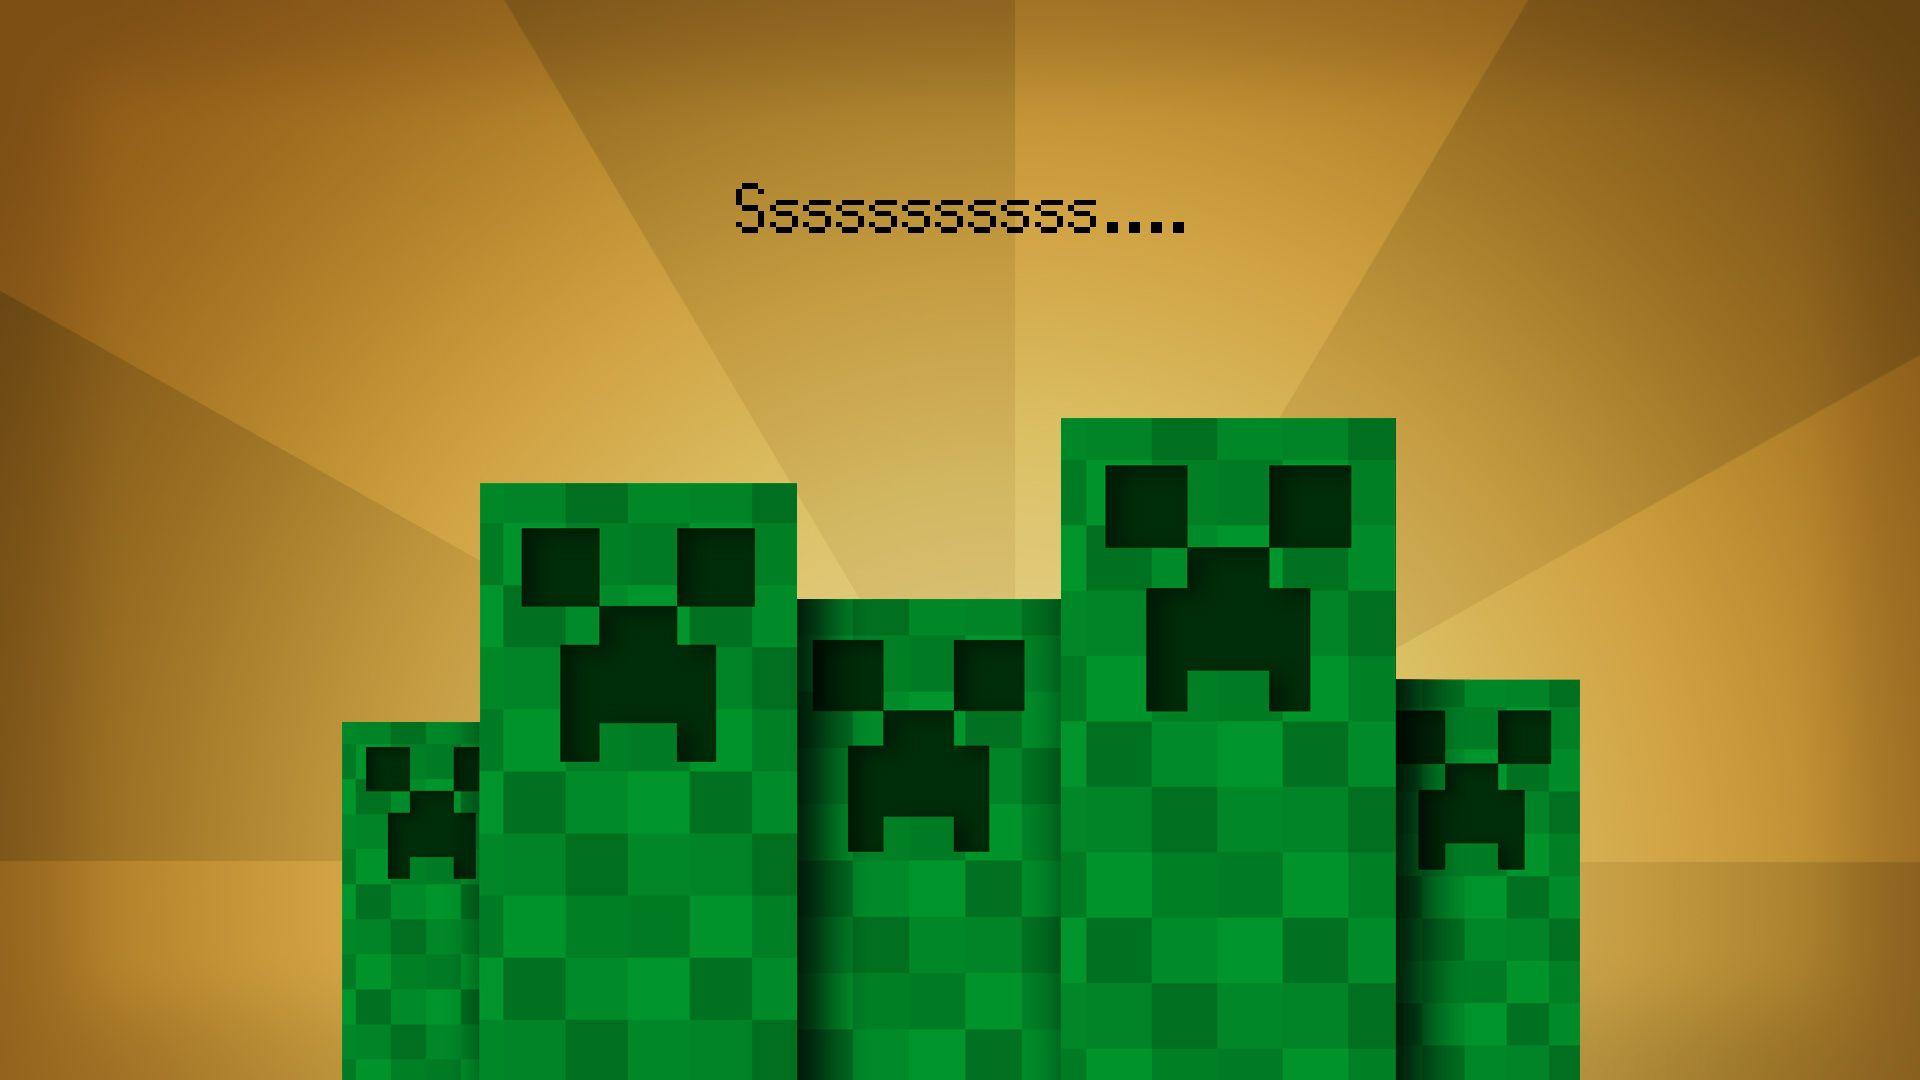 Creeper Minecraft Cool Backgrounds HD Wallpaper